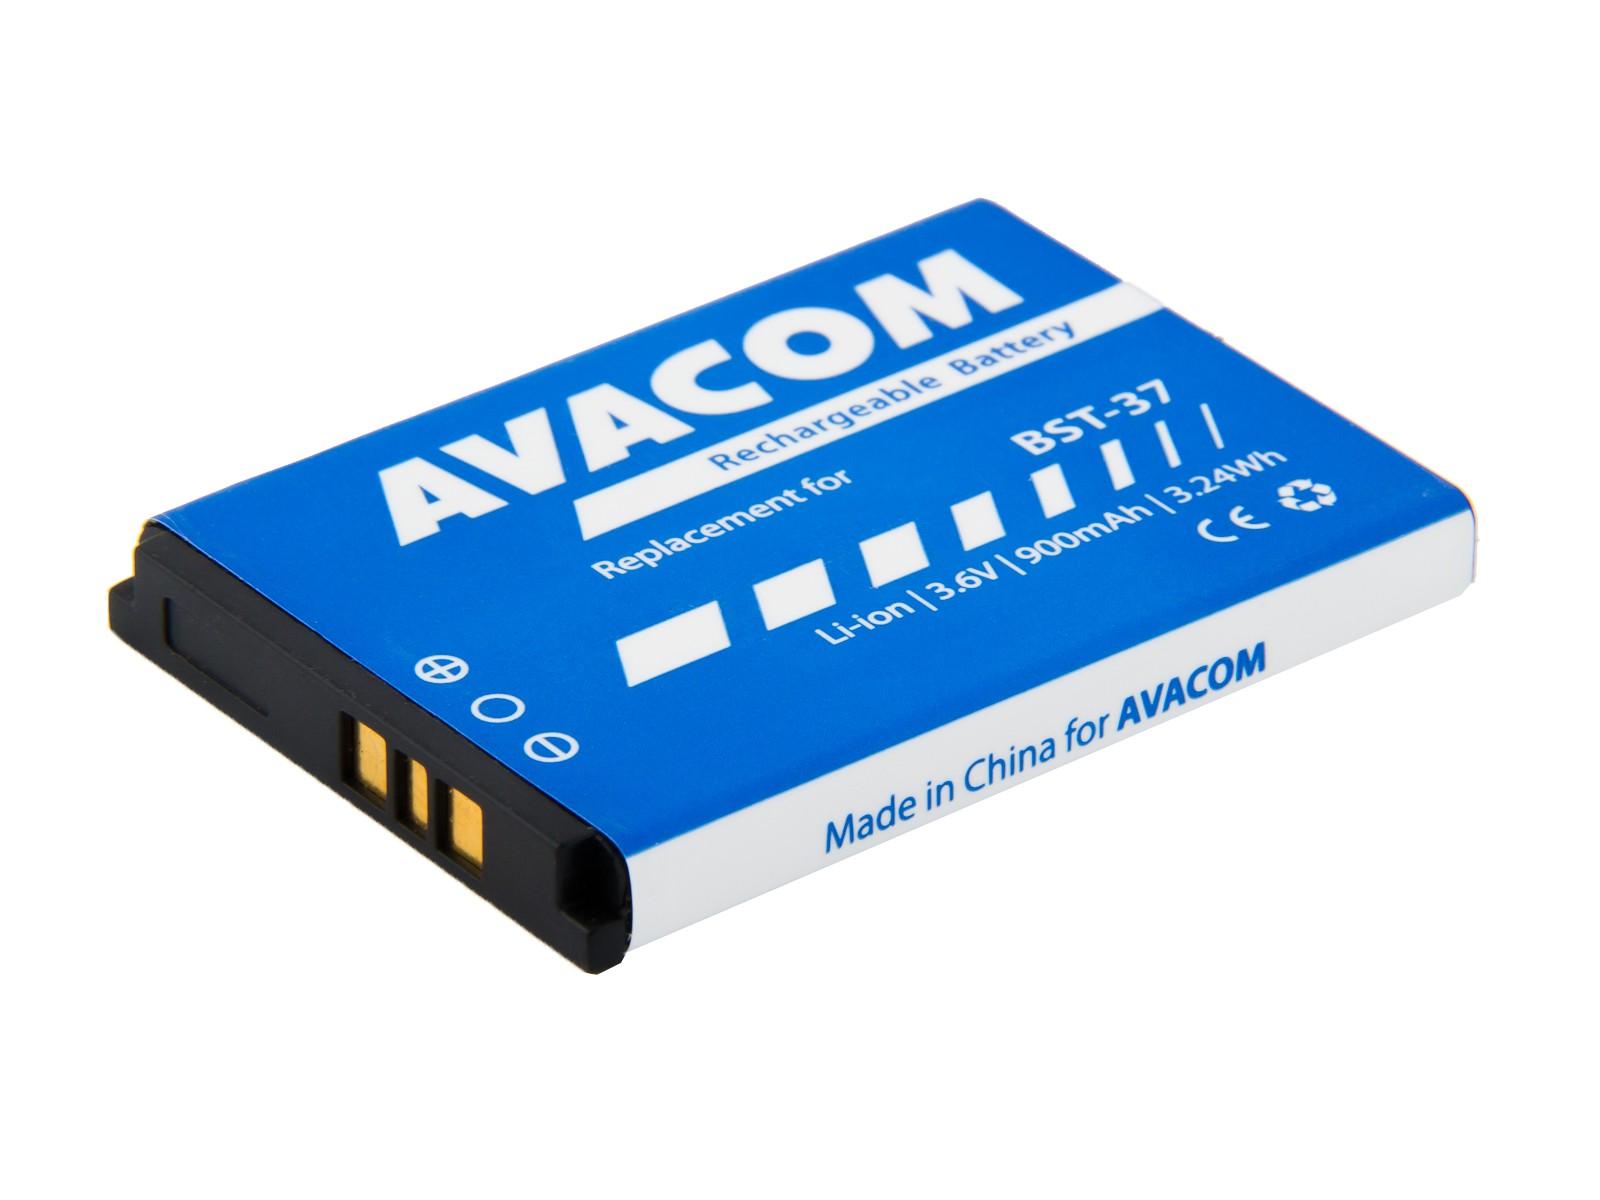 Baterie AVACOM GSSE-K750-900 do mobilu Sony Ericsson K750, W800 Li-Ion 3,7V 900mAh